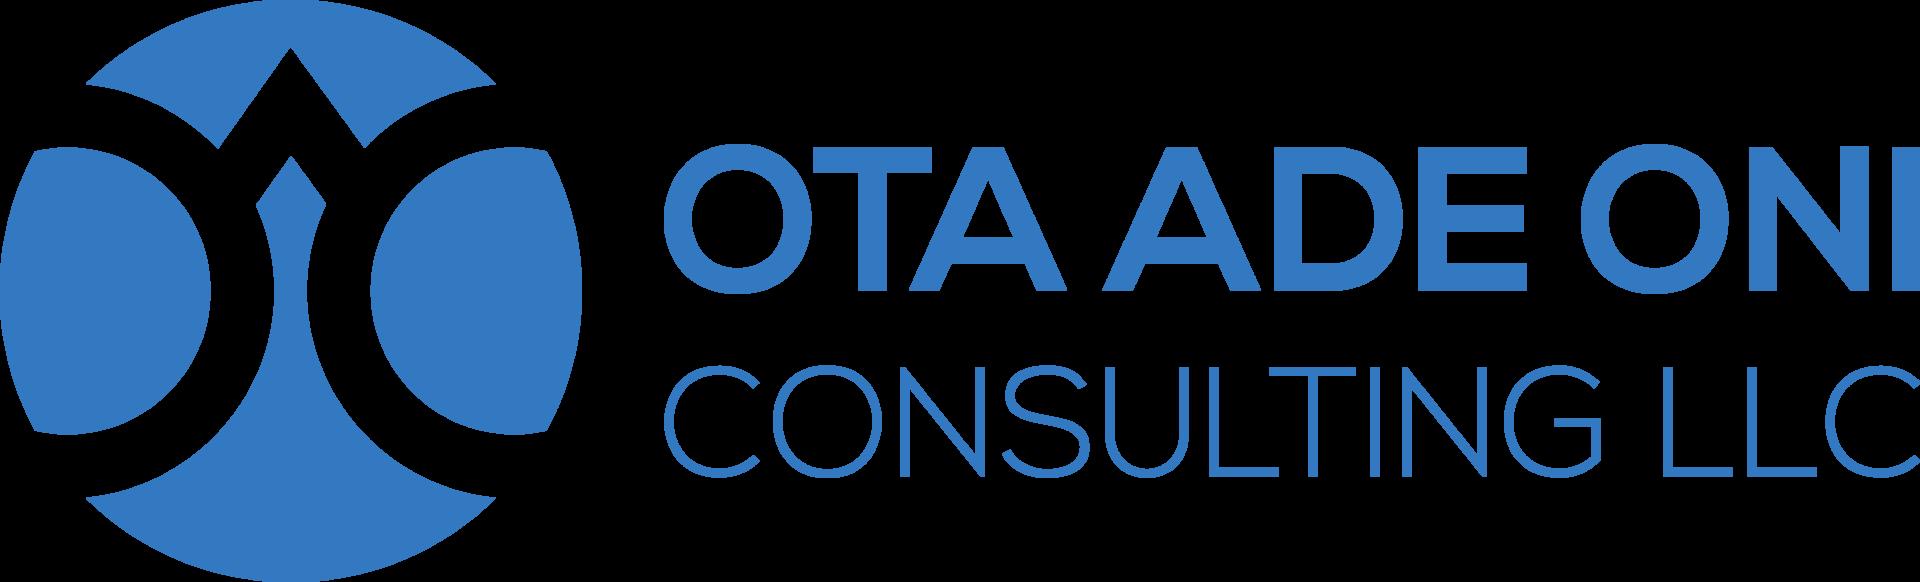 38374465_Ota Ade Oni Consulting LLC_Finished